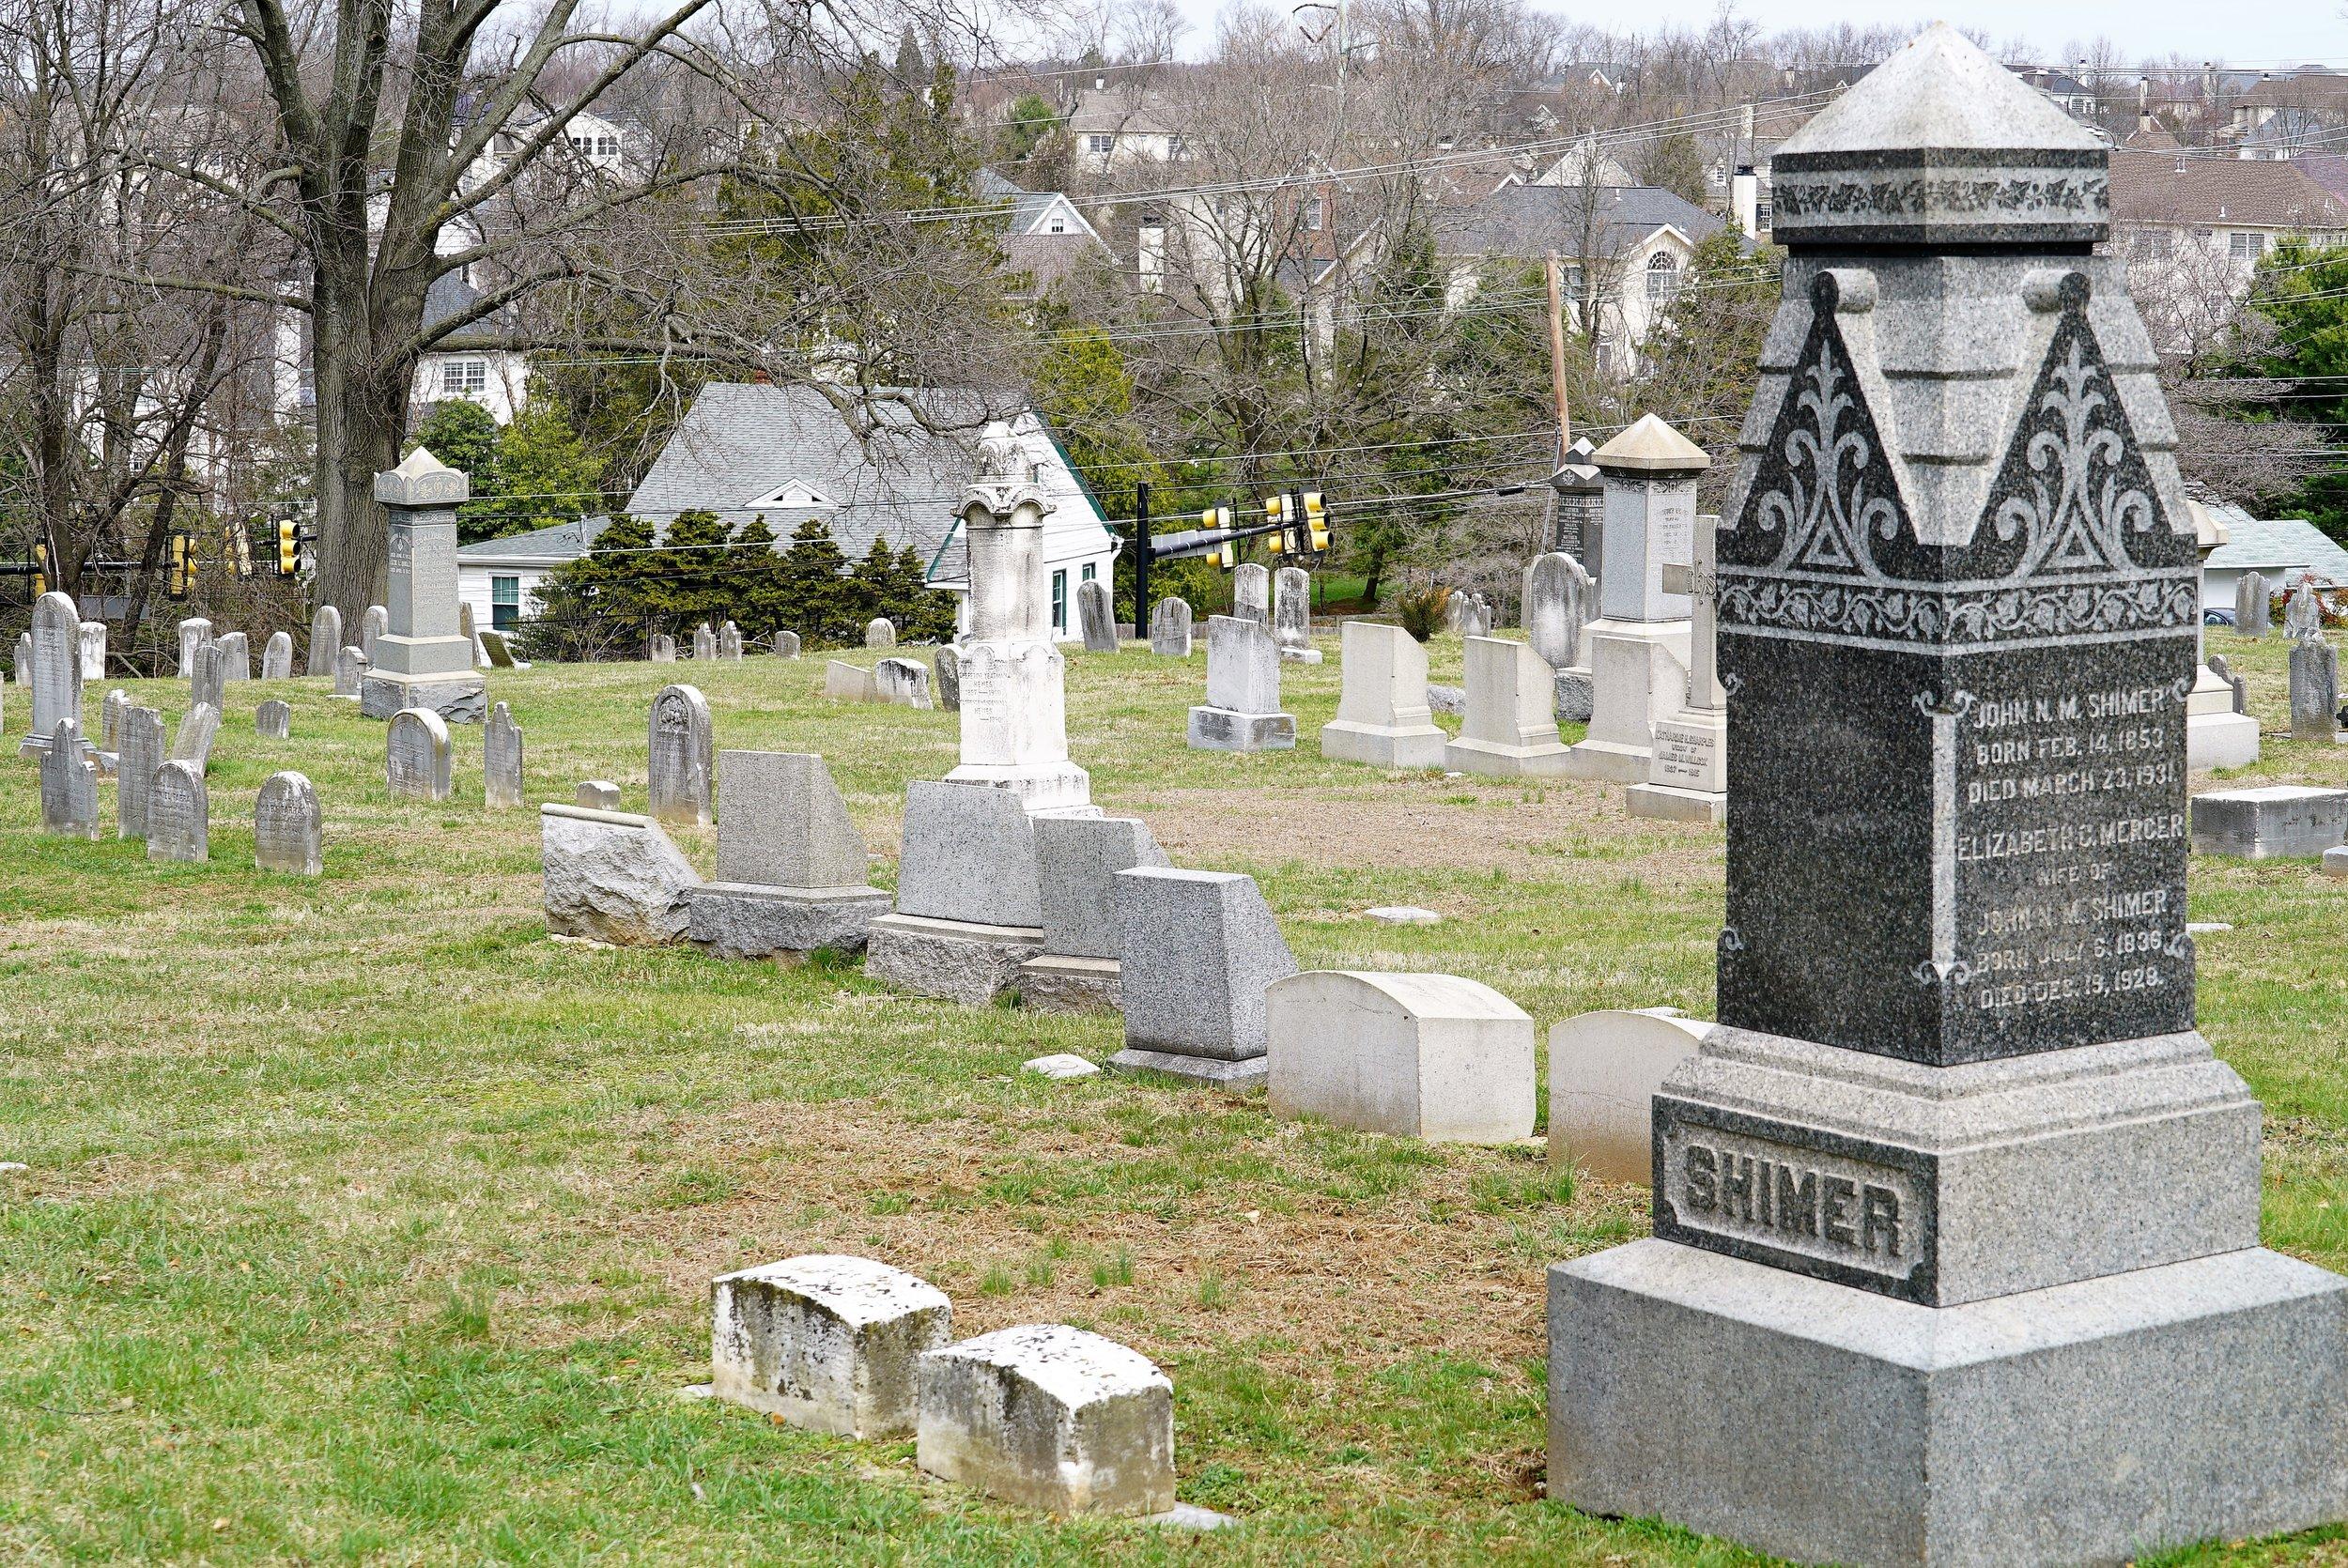 The hillside cemetery at Saint John's Episcopal Church. Glen Mills, PA.